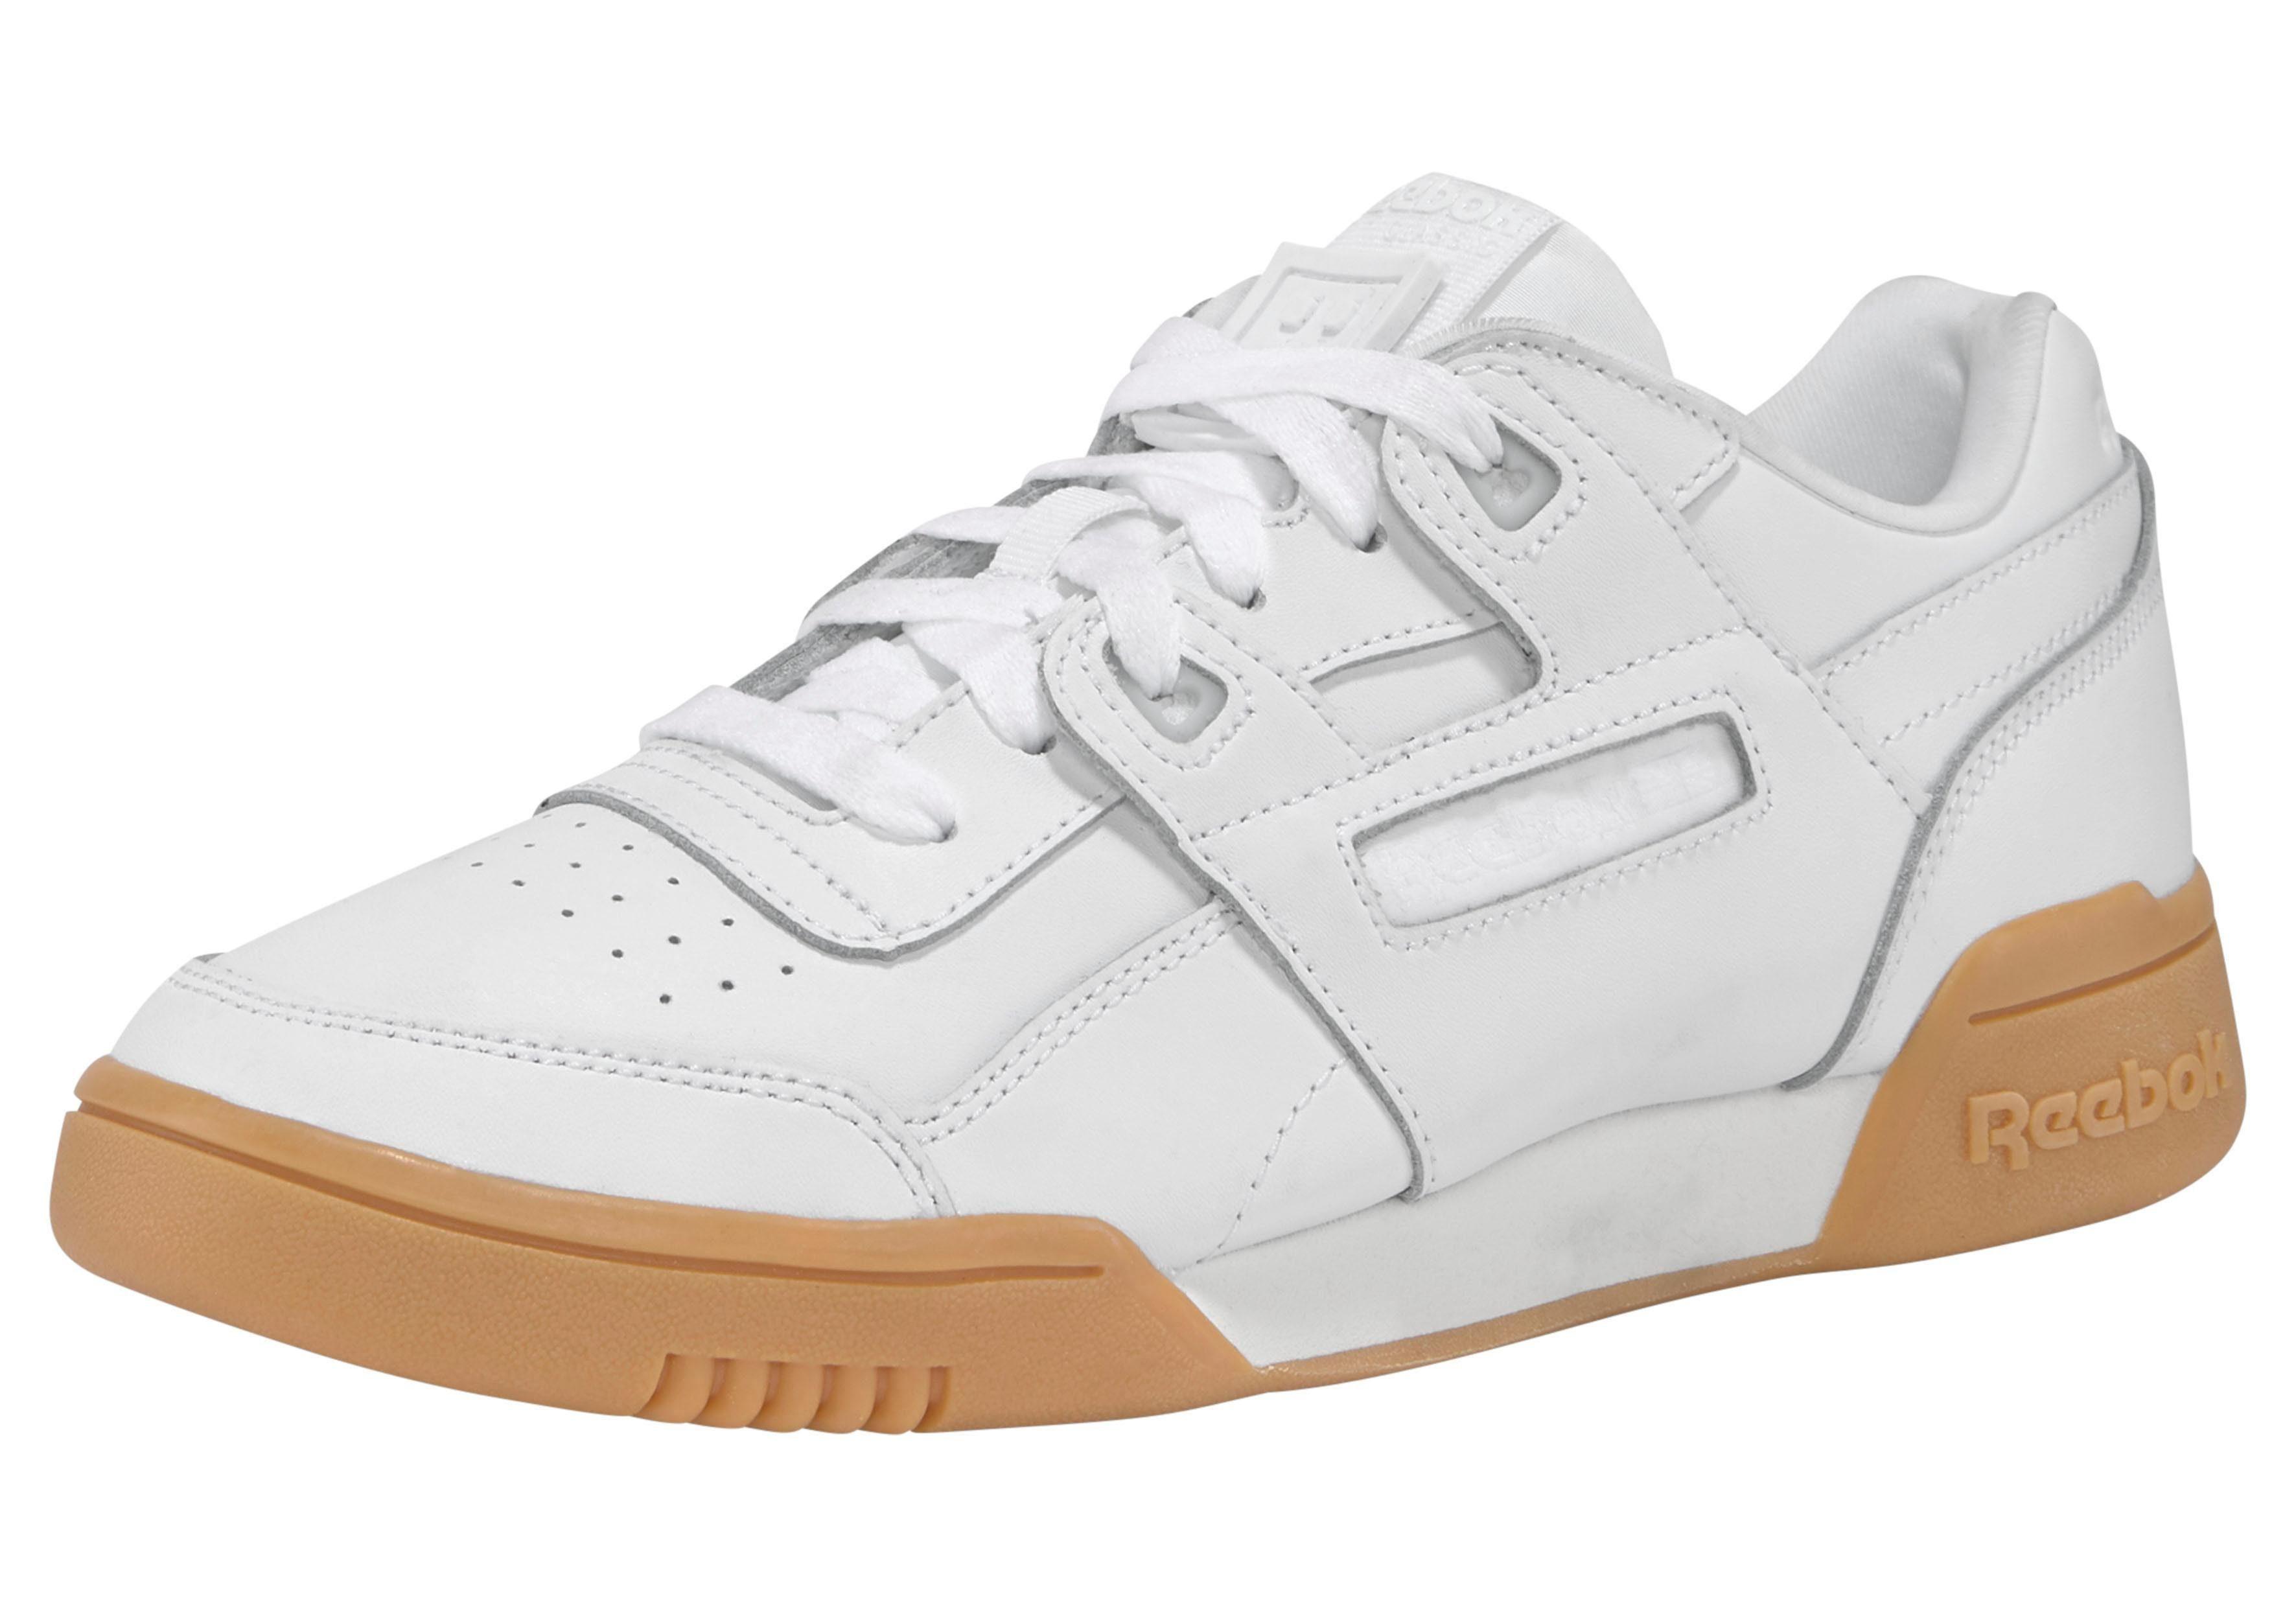 Reebok Classic »Workout Plus« Sneaker, Sportlicher Sneaker von Reebok Classic online kaufen   OTTO